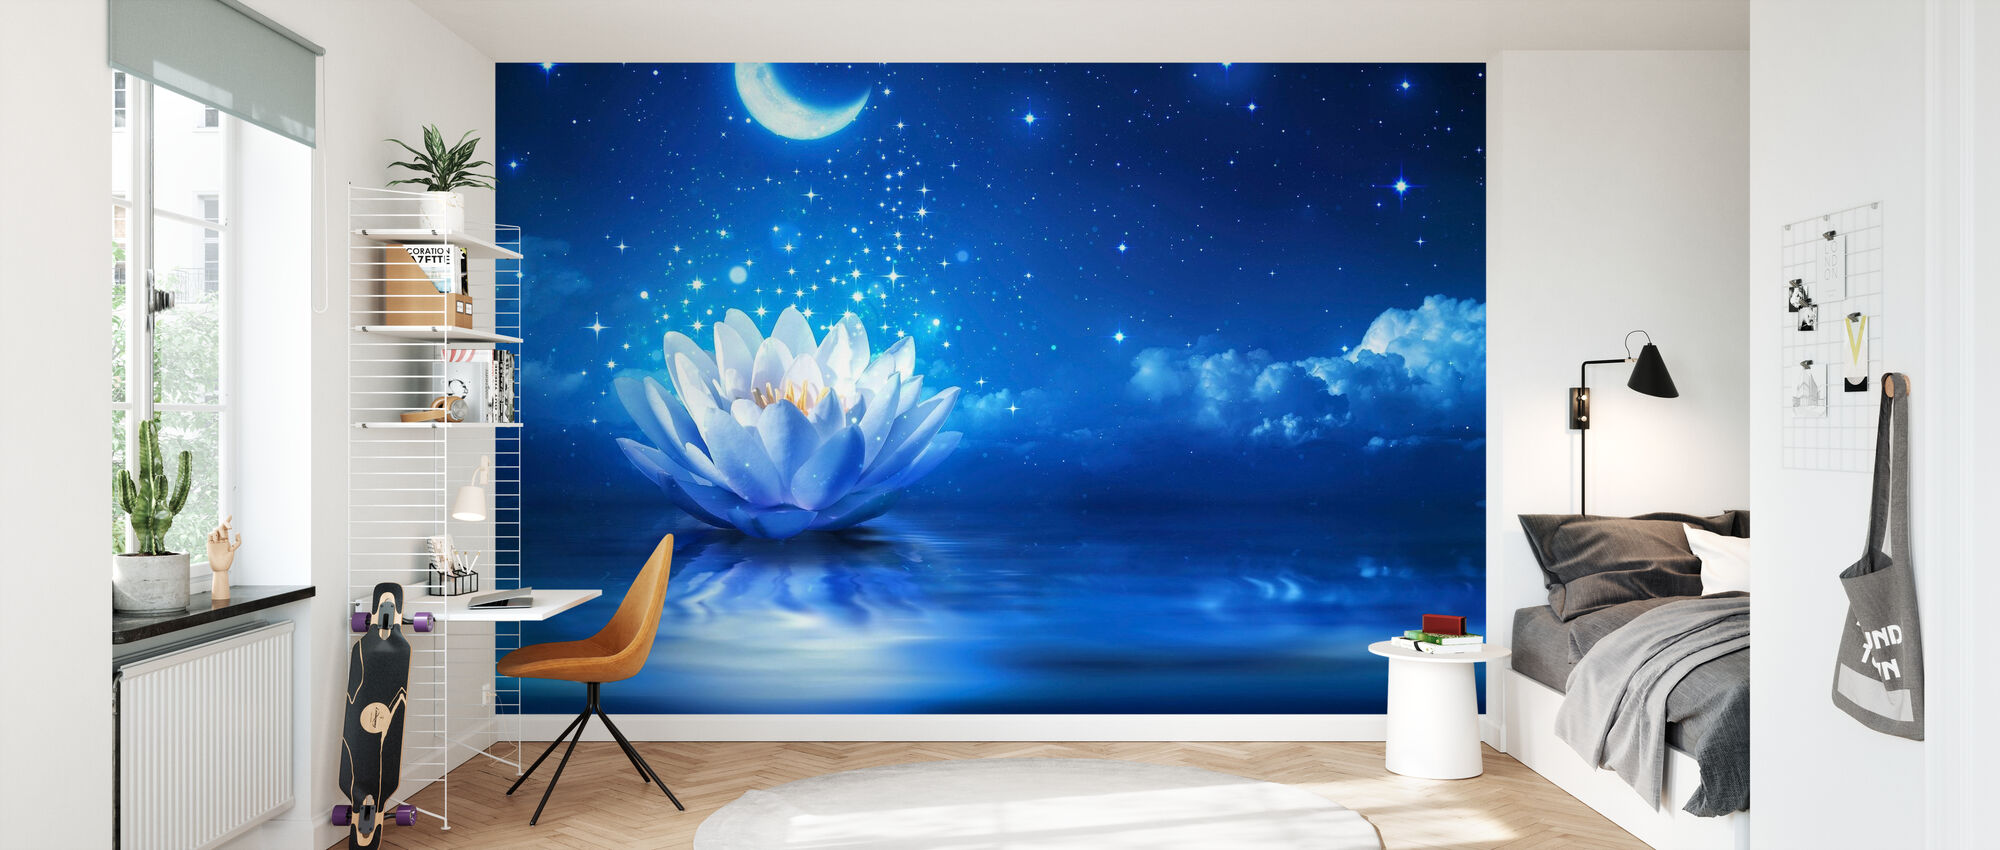 Waterlily Moon - Wallpaper - Kids Room